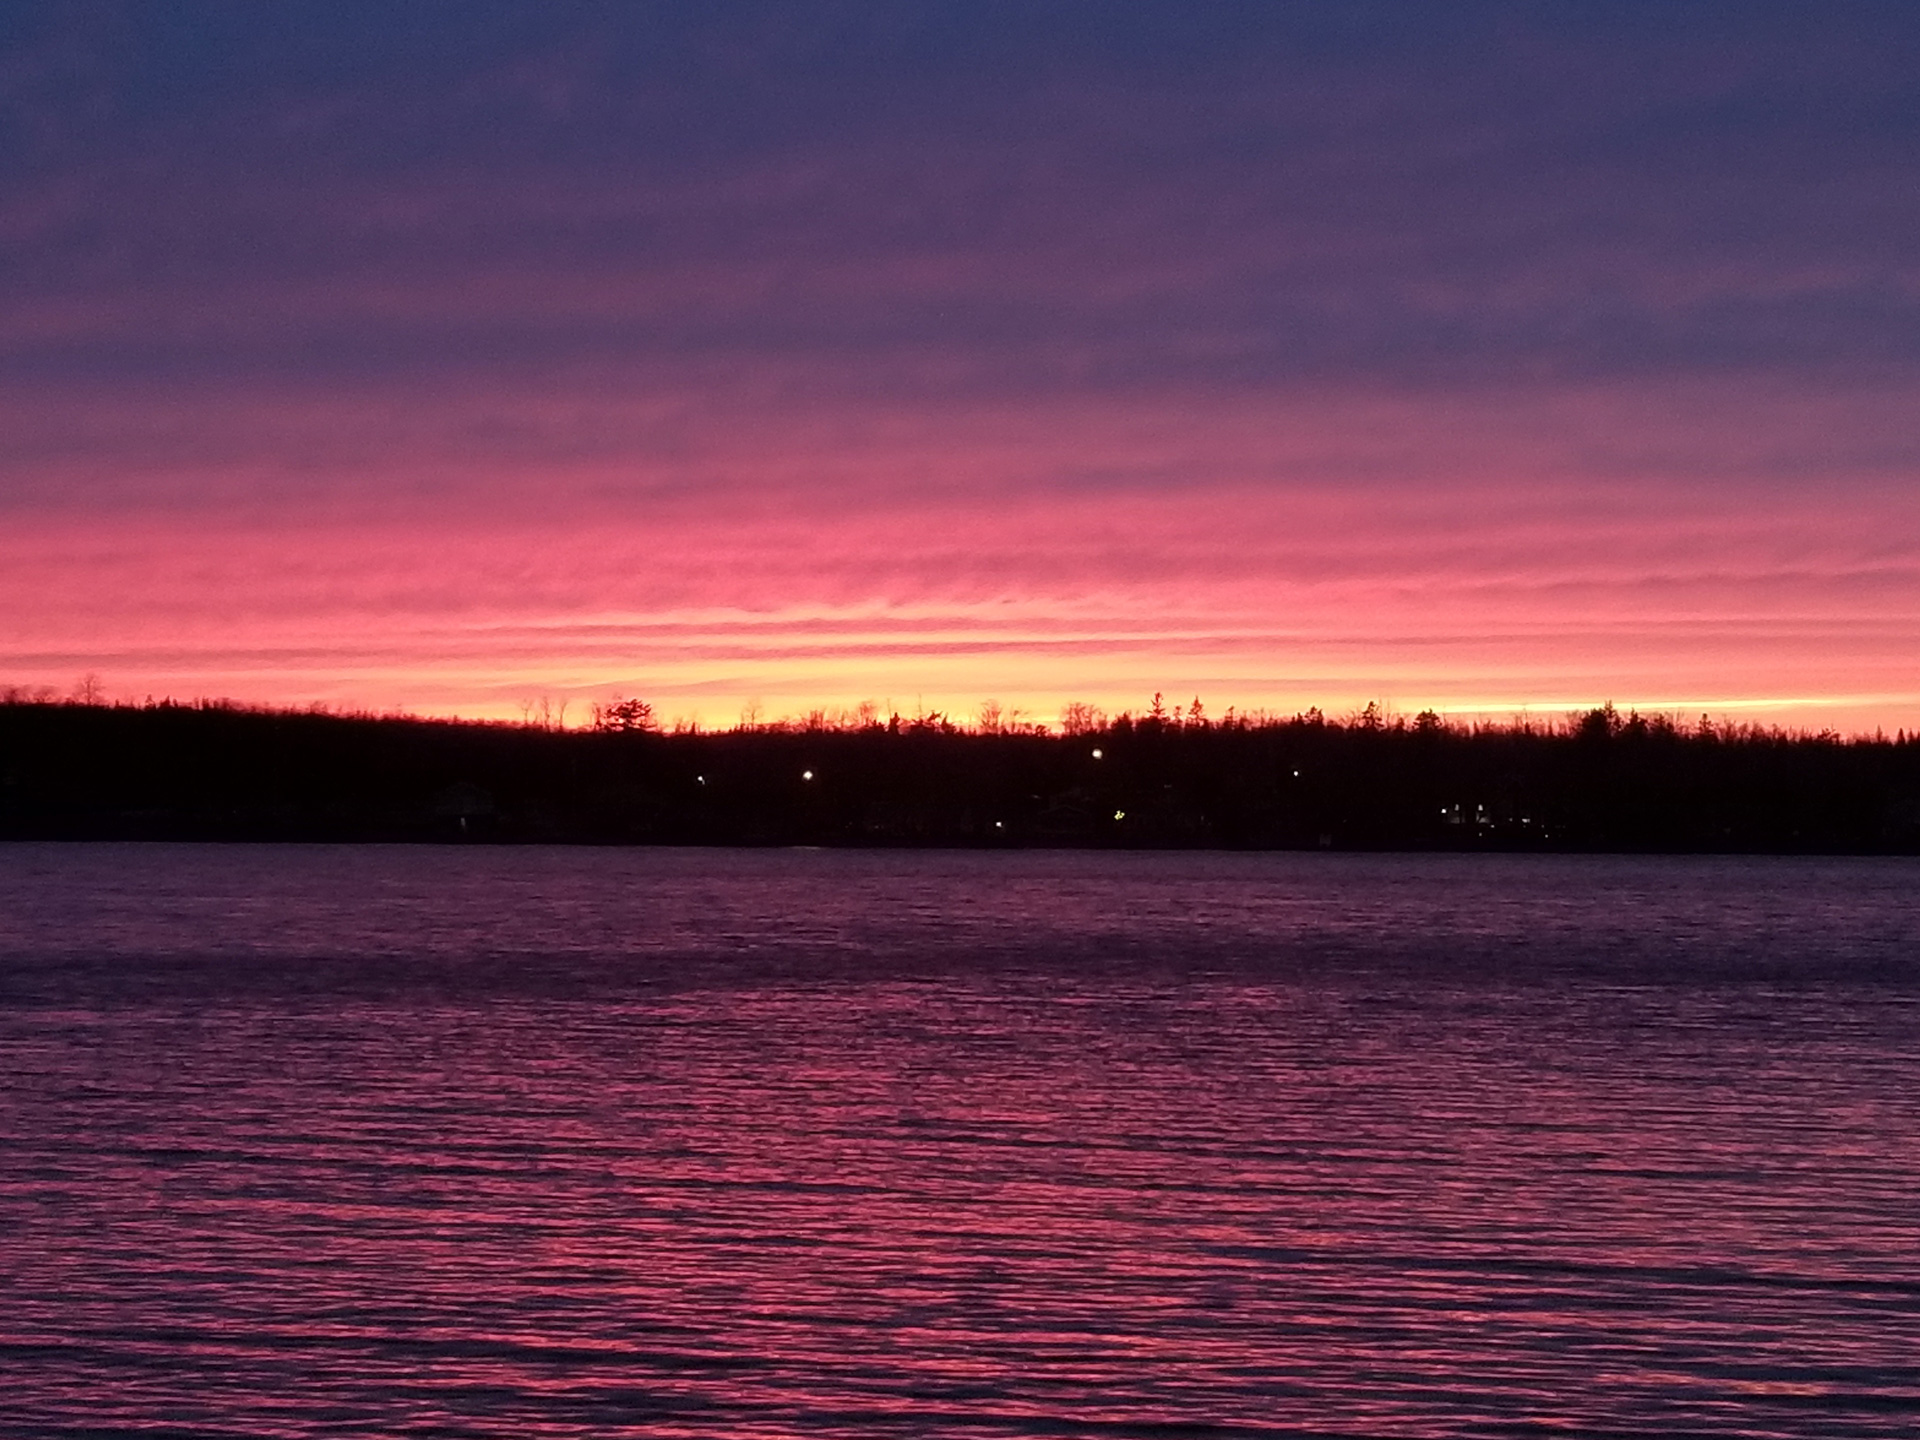 Sunset on the lake April 22, 2020